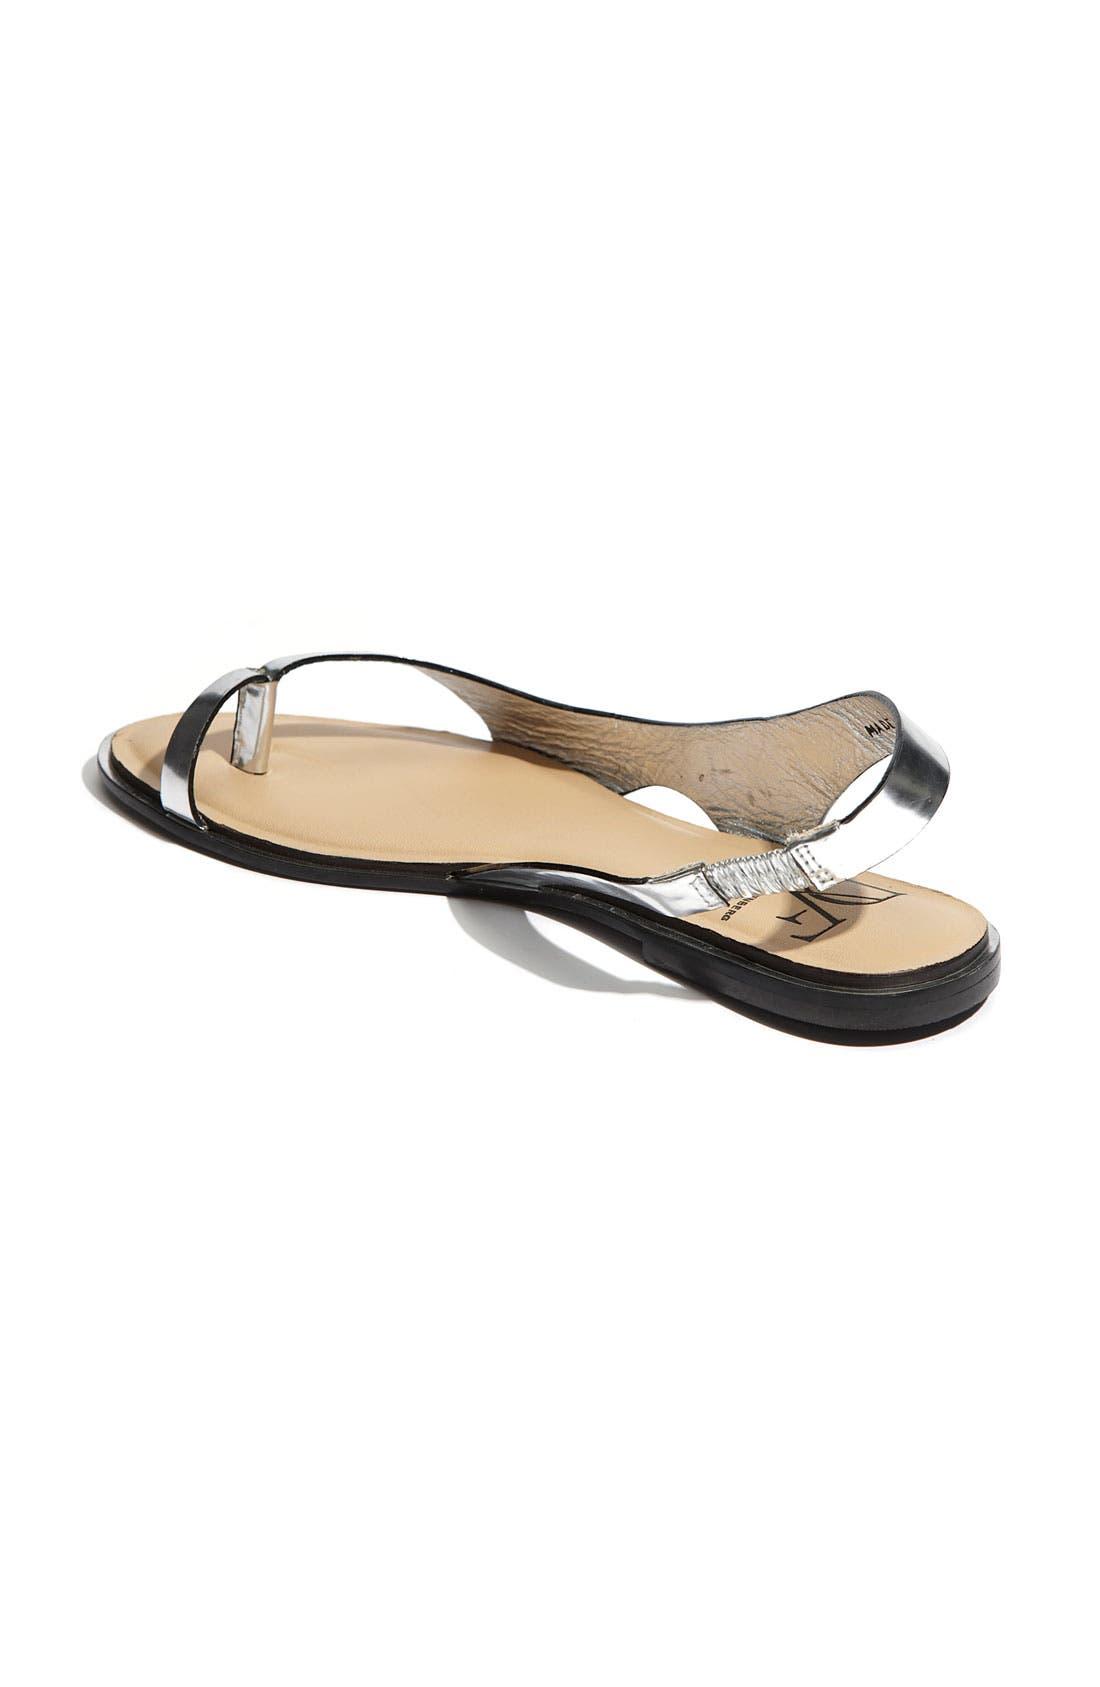 Alternate Image 2  - Diane von Furstenberg 'Kaiti' Slingback Sandal